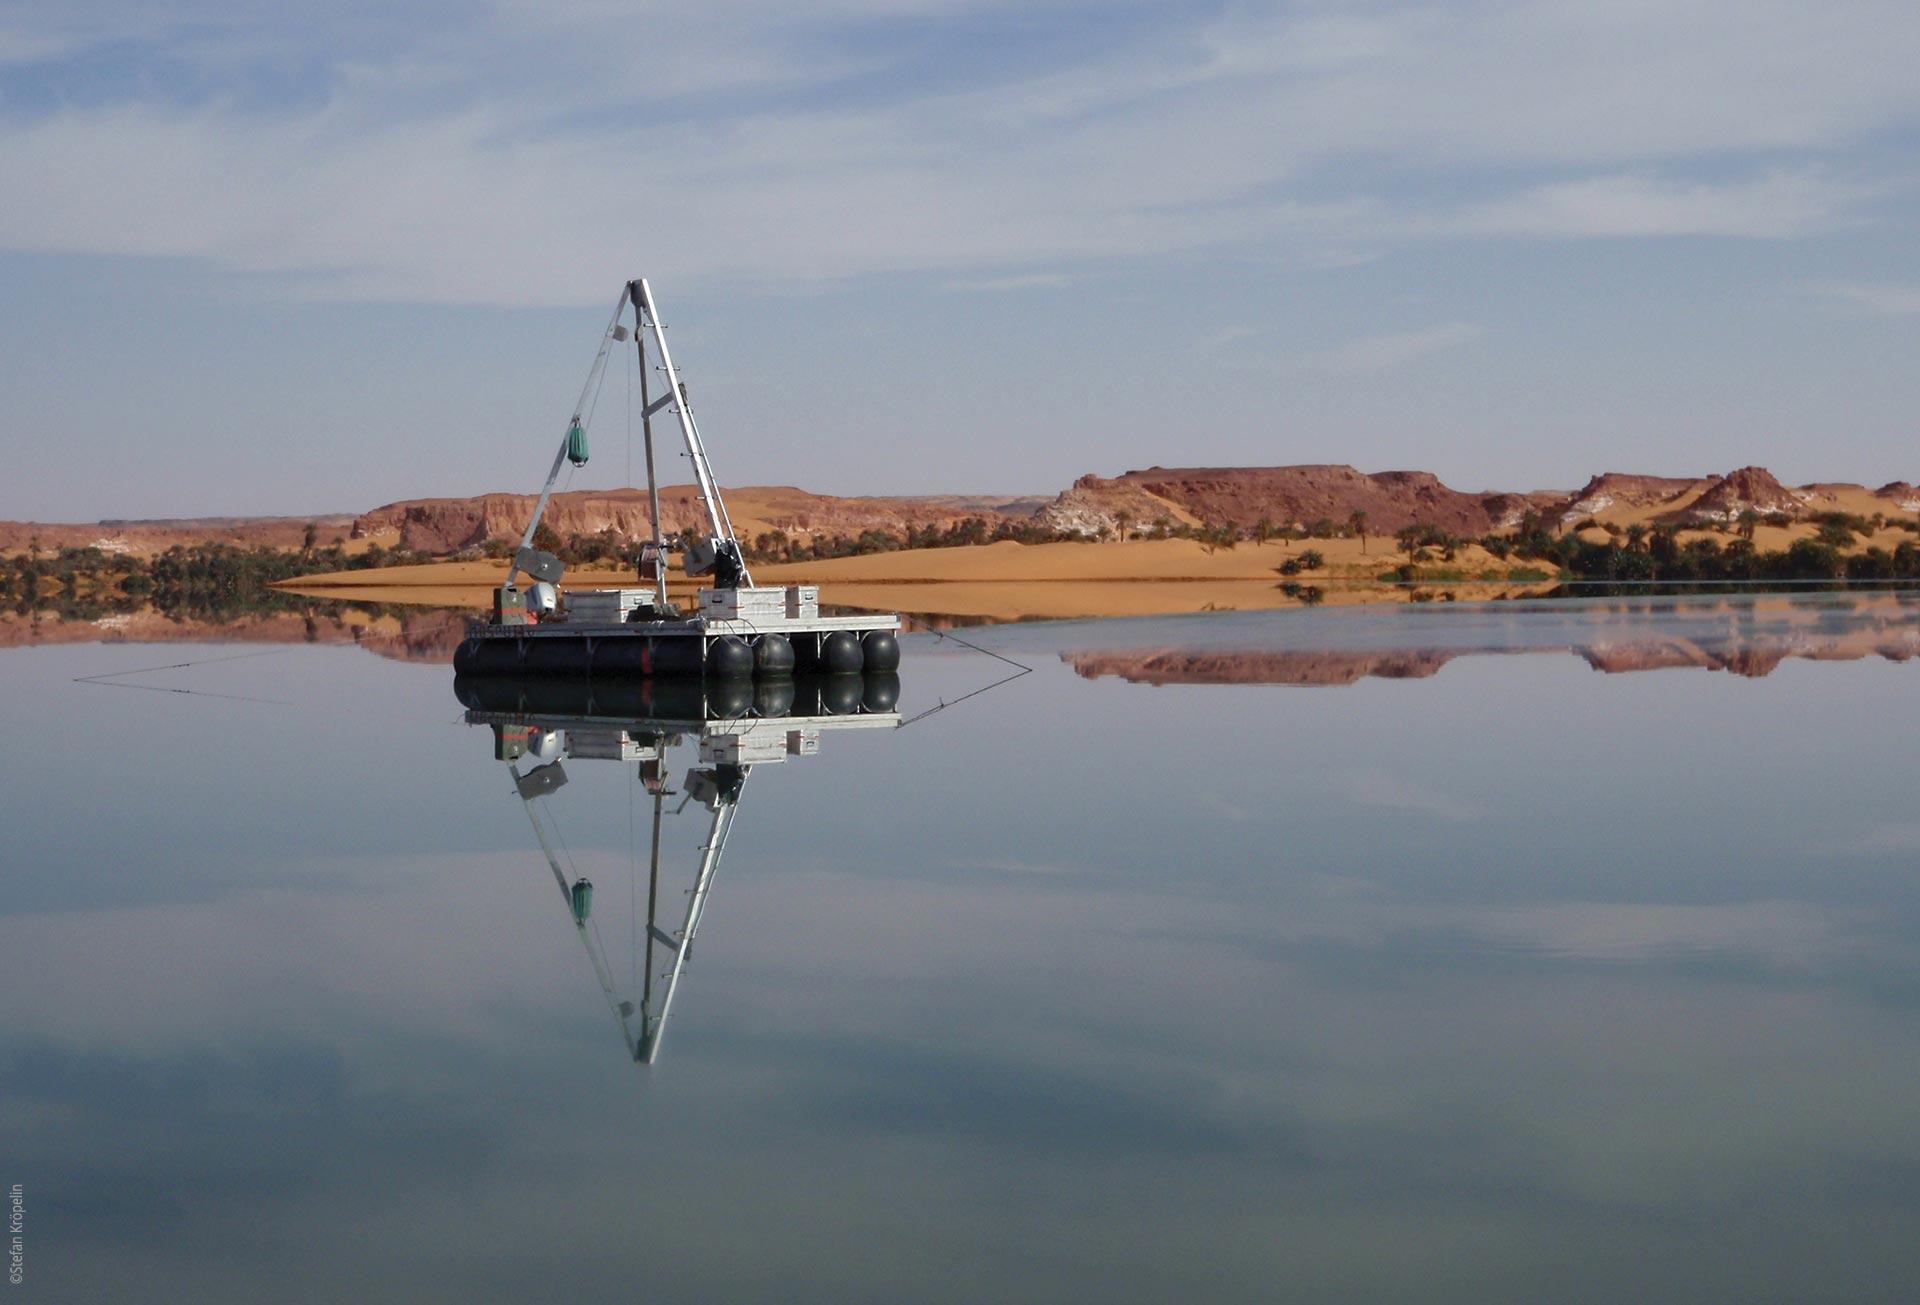 Die Seen von Ounianga, Bohrplattform auf dem Lac Yoa, Explore Chad